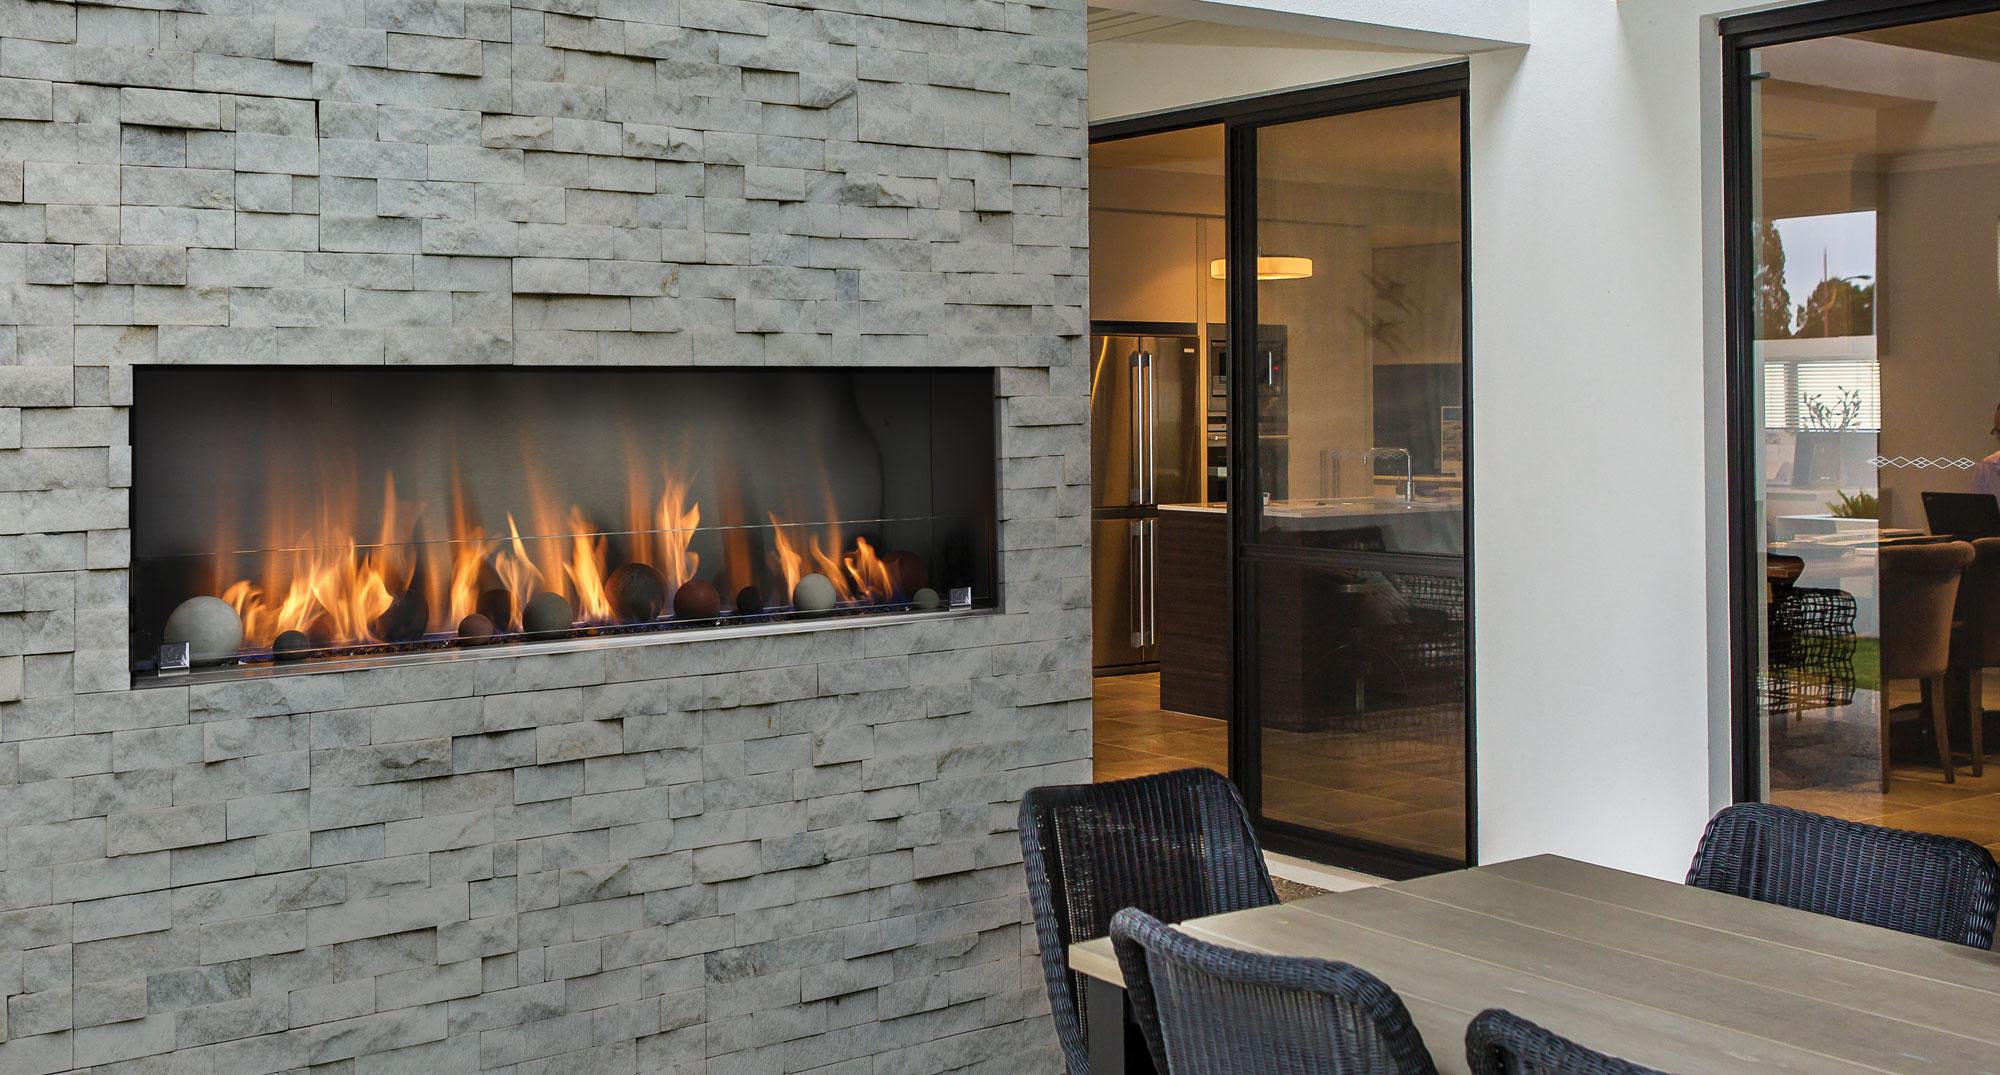 Barbara Jean Outdoor Linear Fireplaces